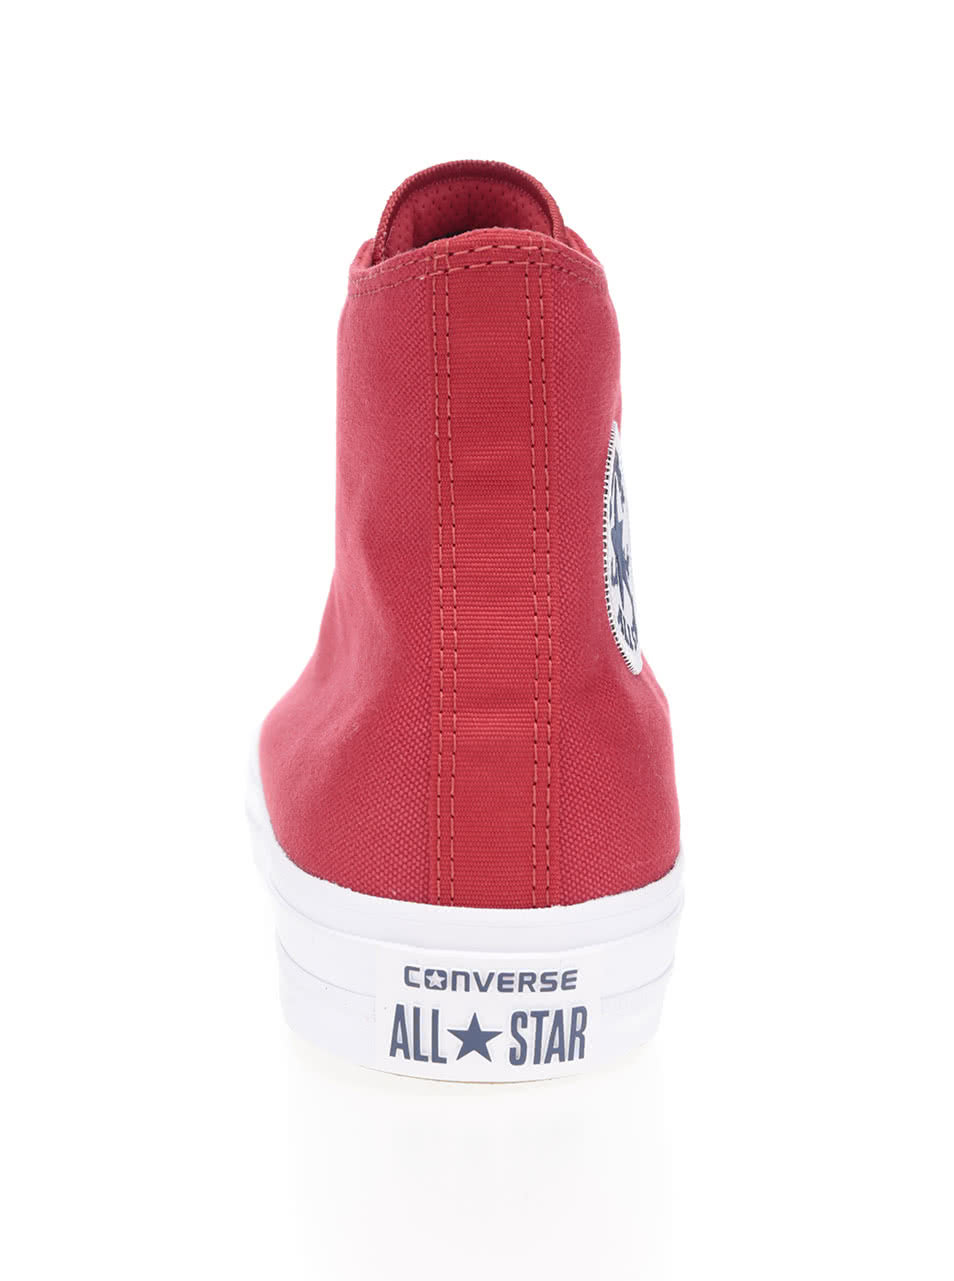 b53d942df24 Červené unisex kotníkové tenisky s bílým logem Converse Chuck Taylor All  Star ...